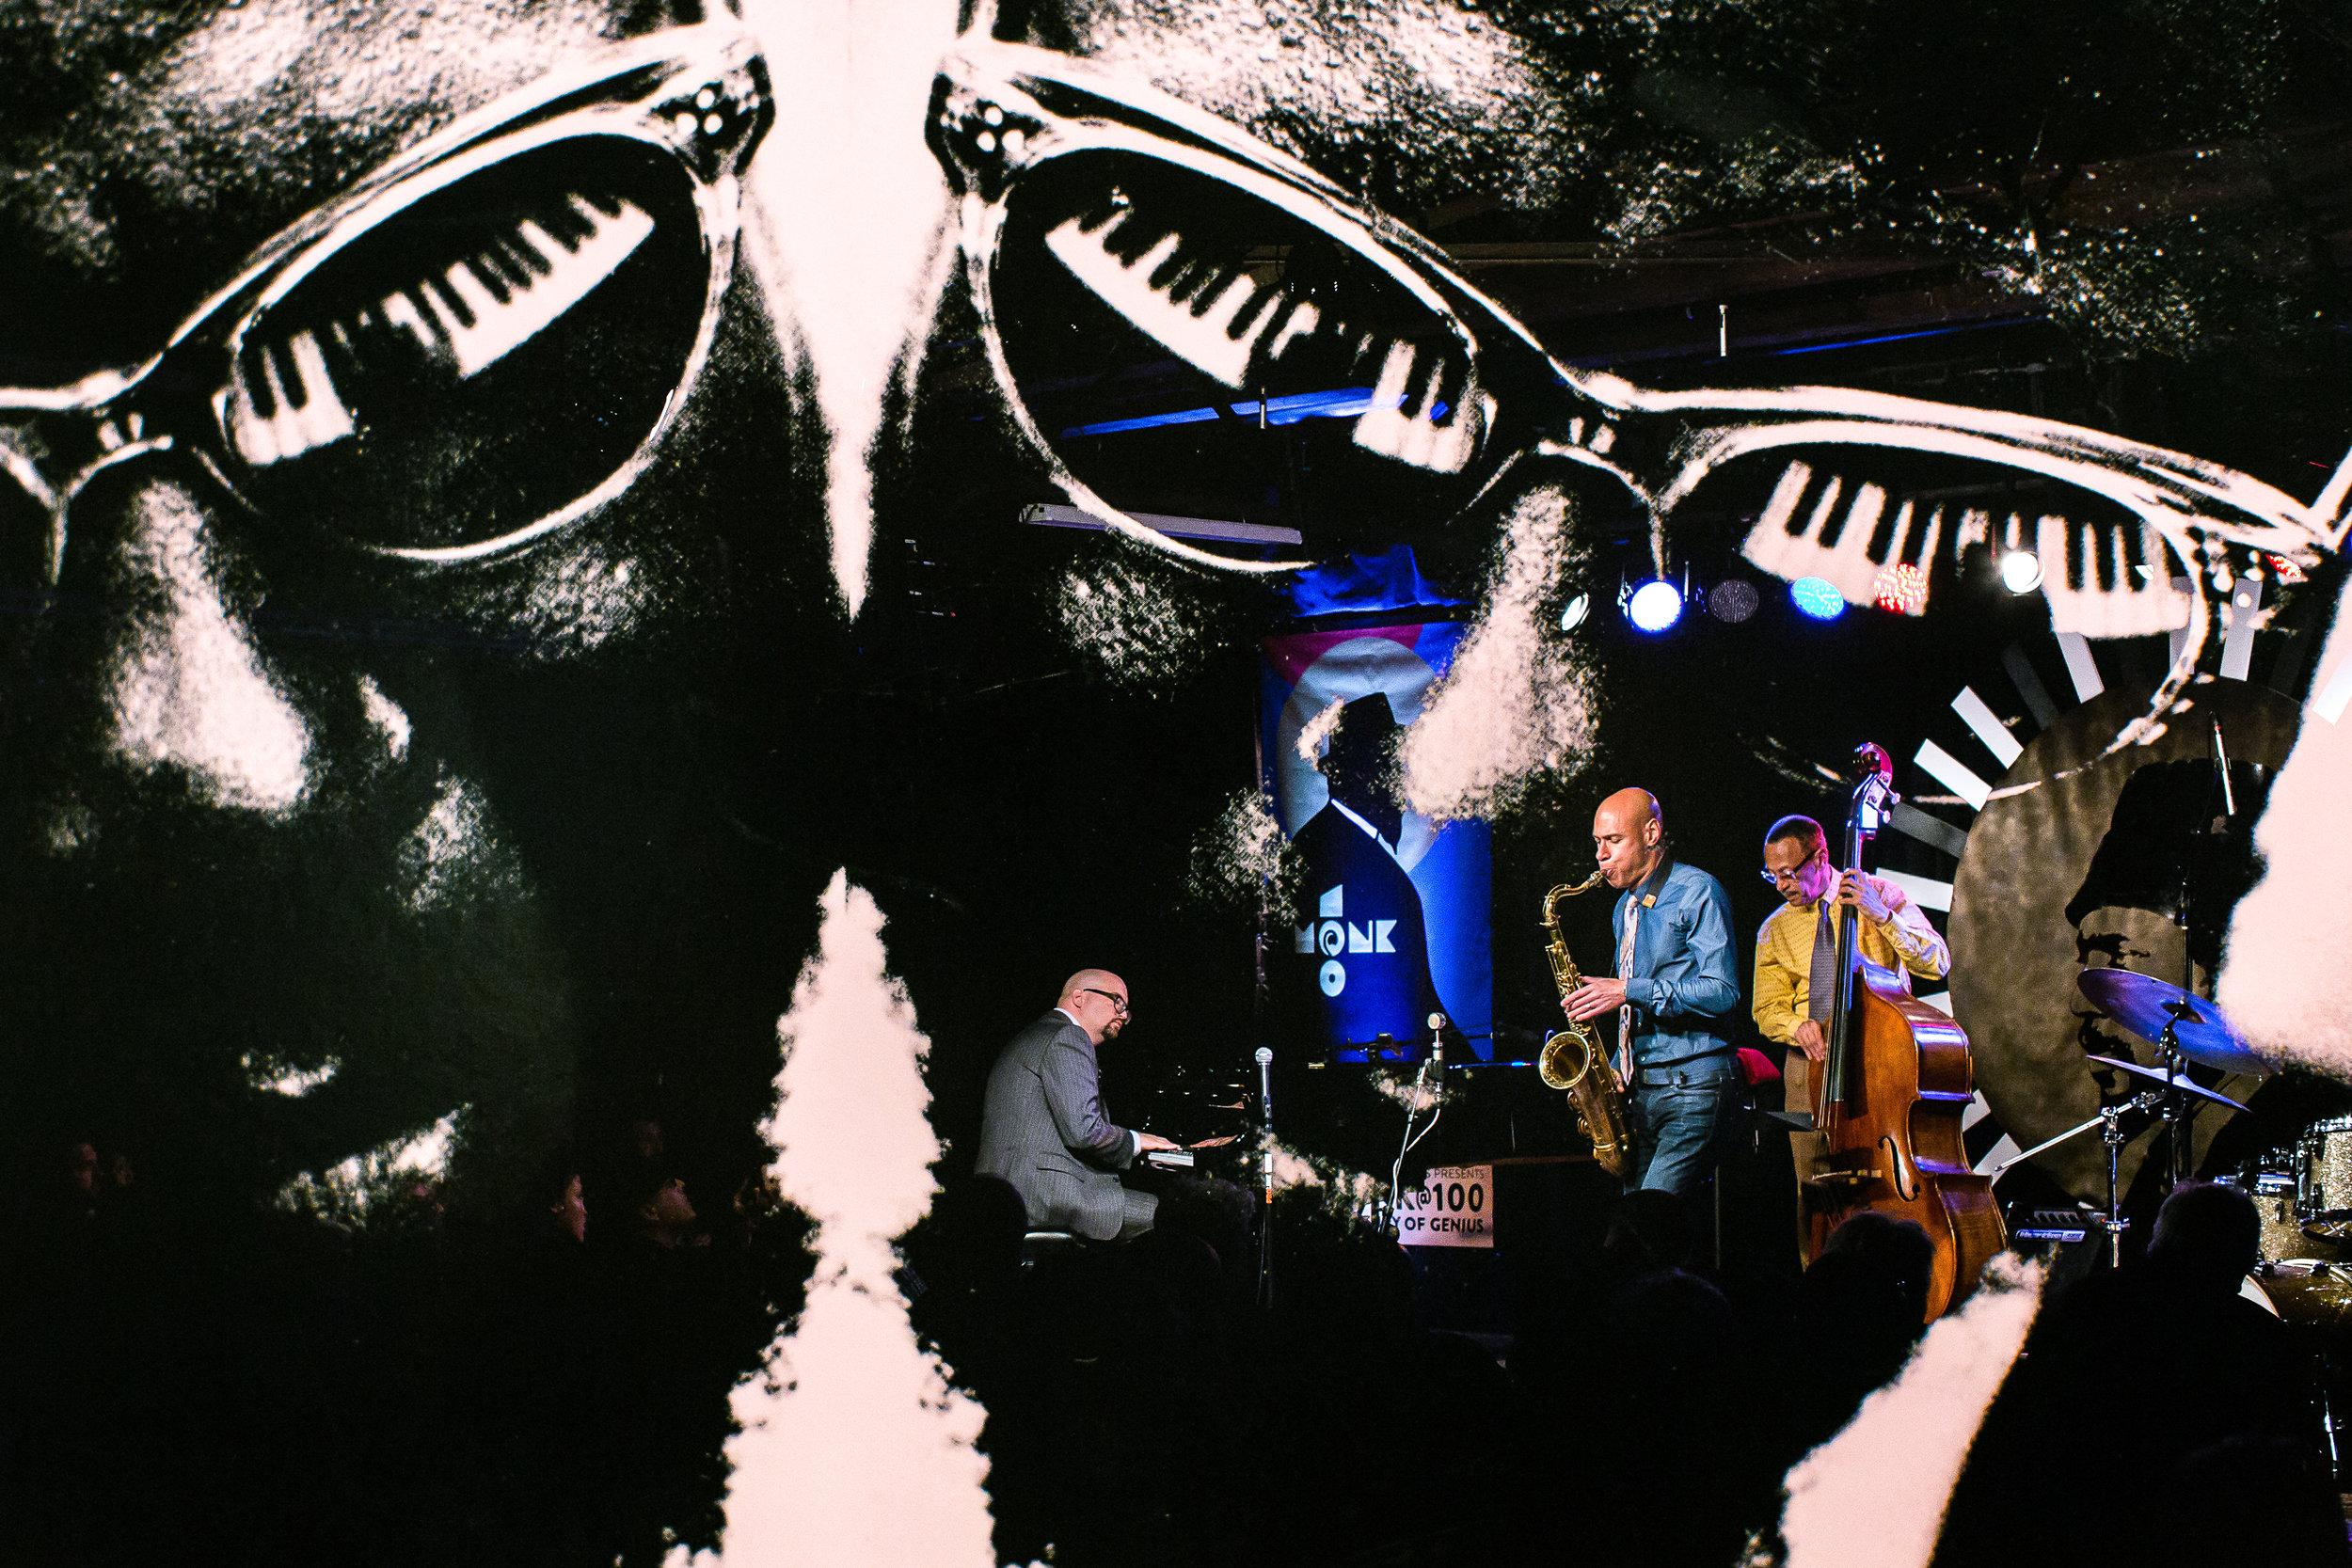 Thelonious_Monk@100_Durham_007.JPG